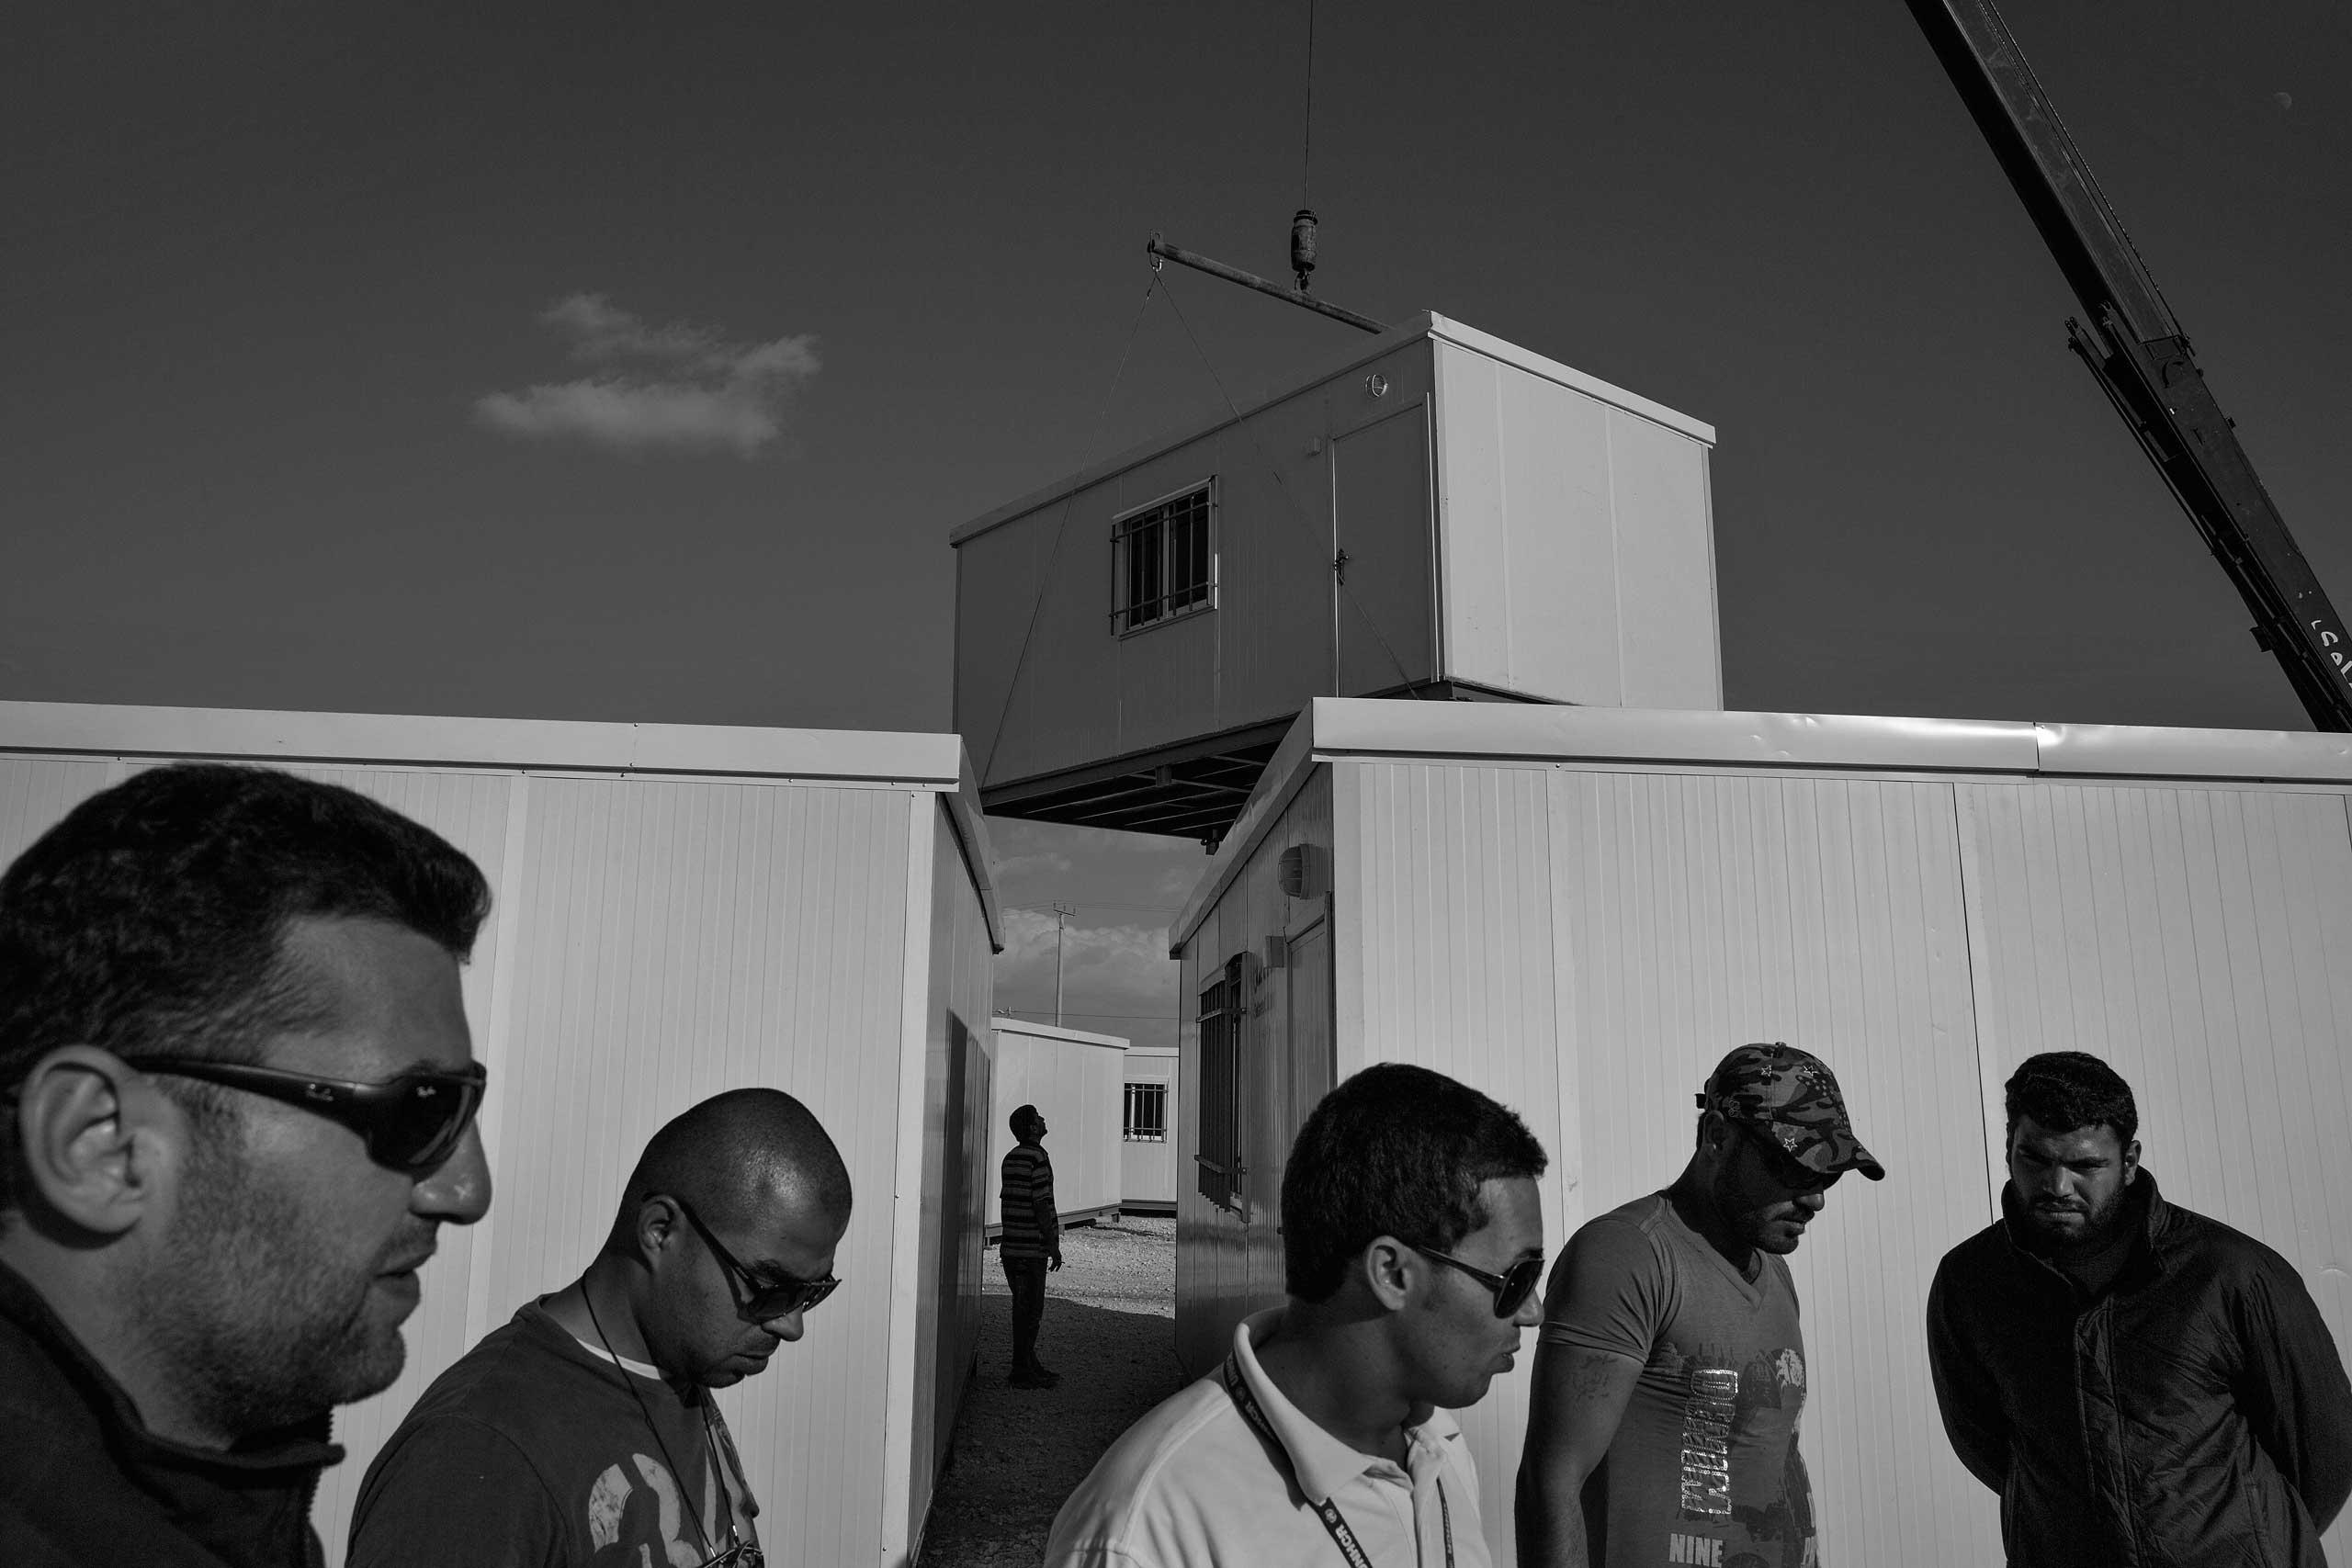 December 2013. Za'atari refugee camp, Jordan. Caravans being delivered to replace tents at the camp.